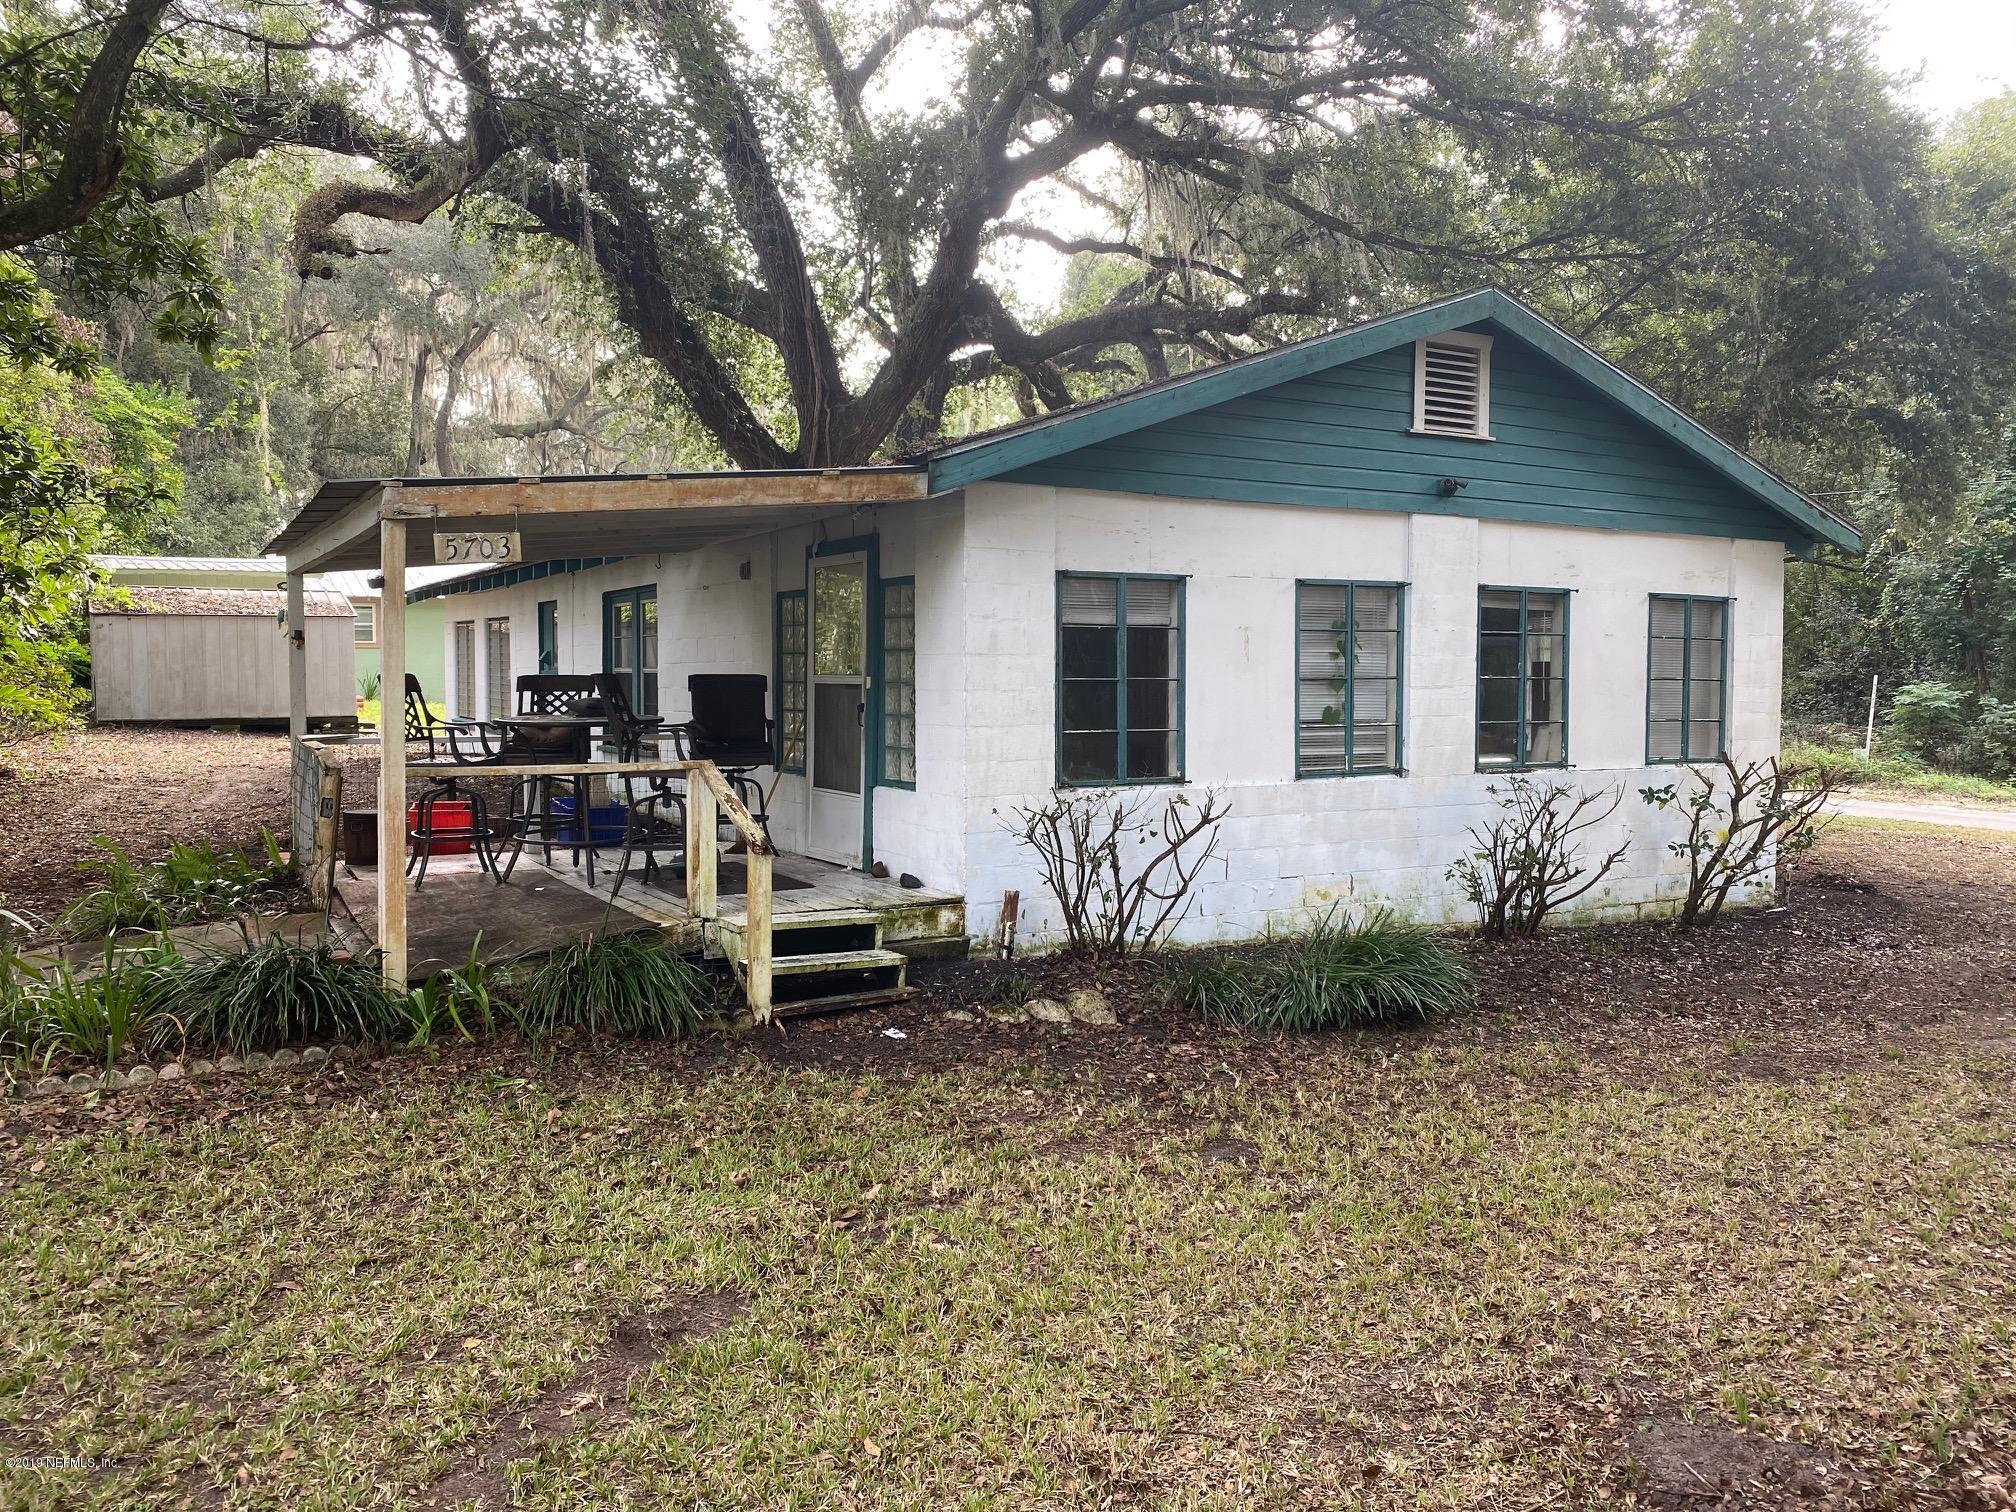 5703 HAMPTON, MELROSE, FLORIDA 32666, 3 Bedrooms Bedrooms, ,1 BathroomBathrooms,Residential,For sale,HAMPTON,1024144